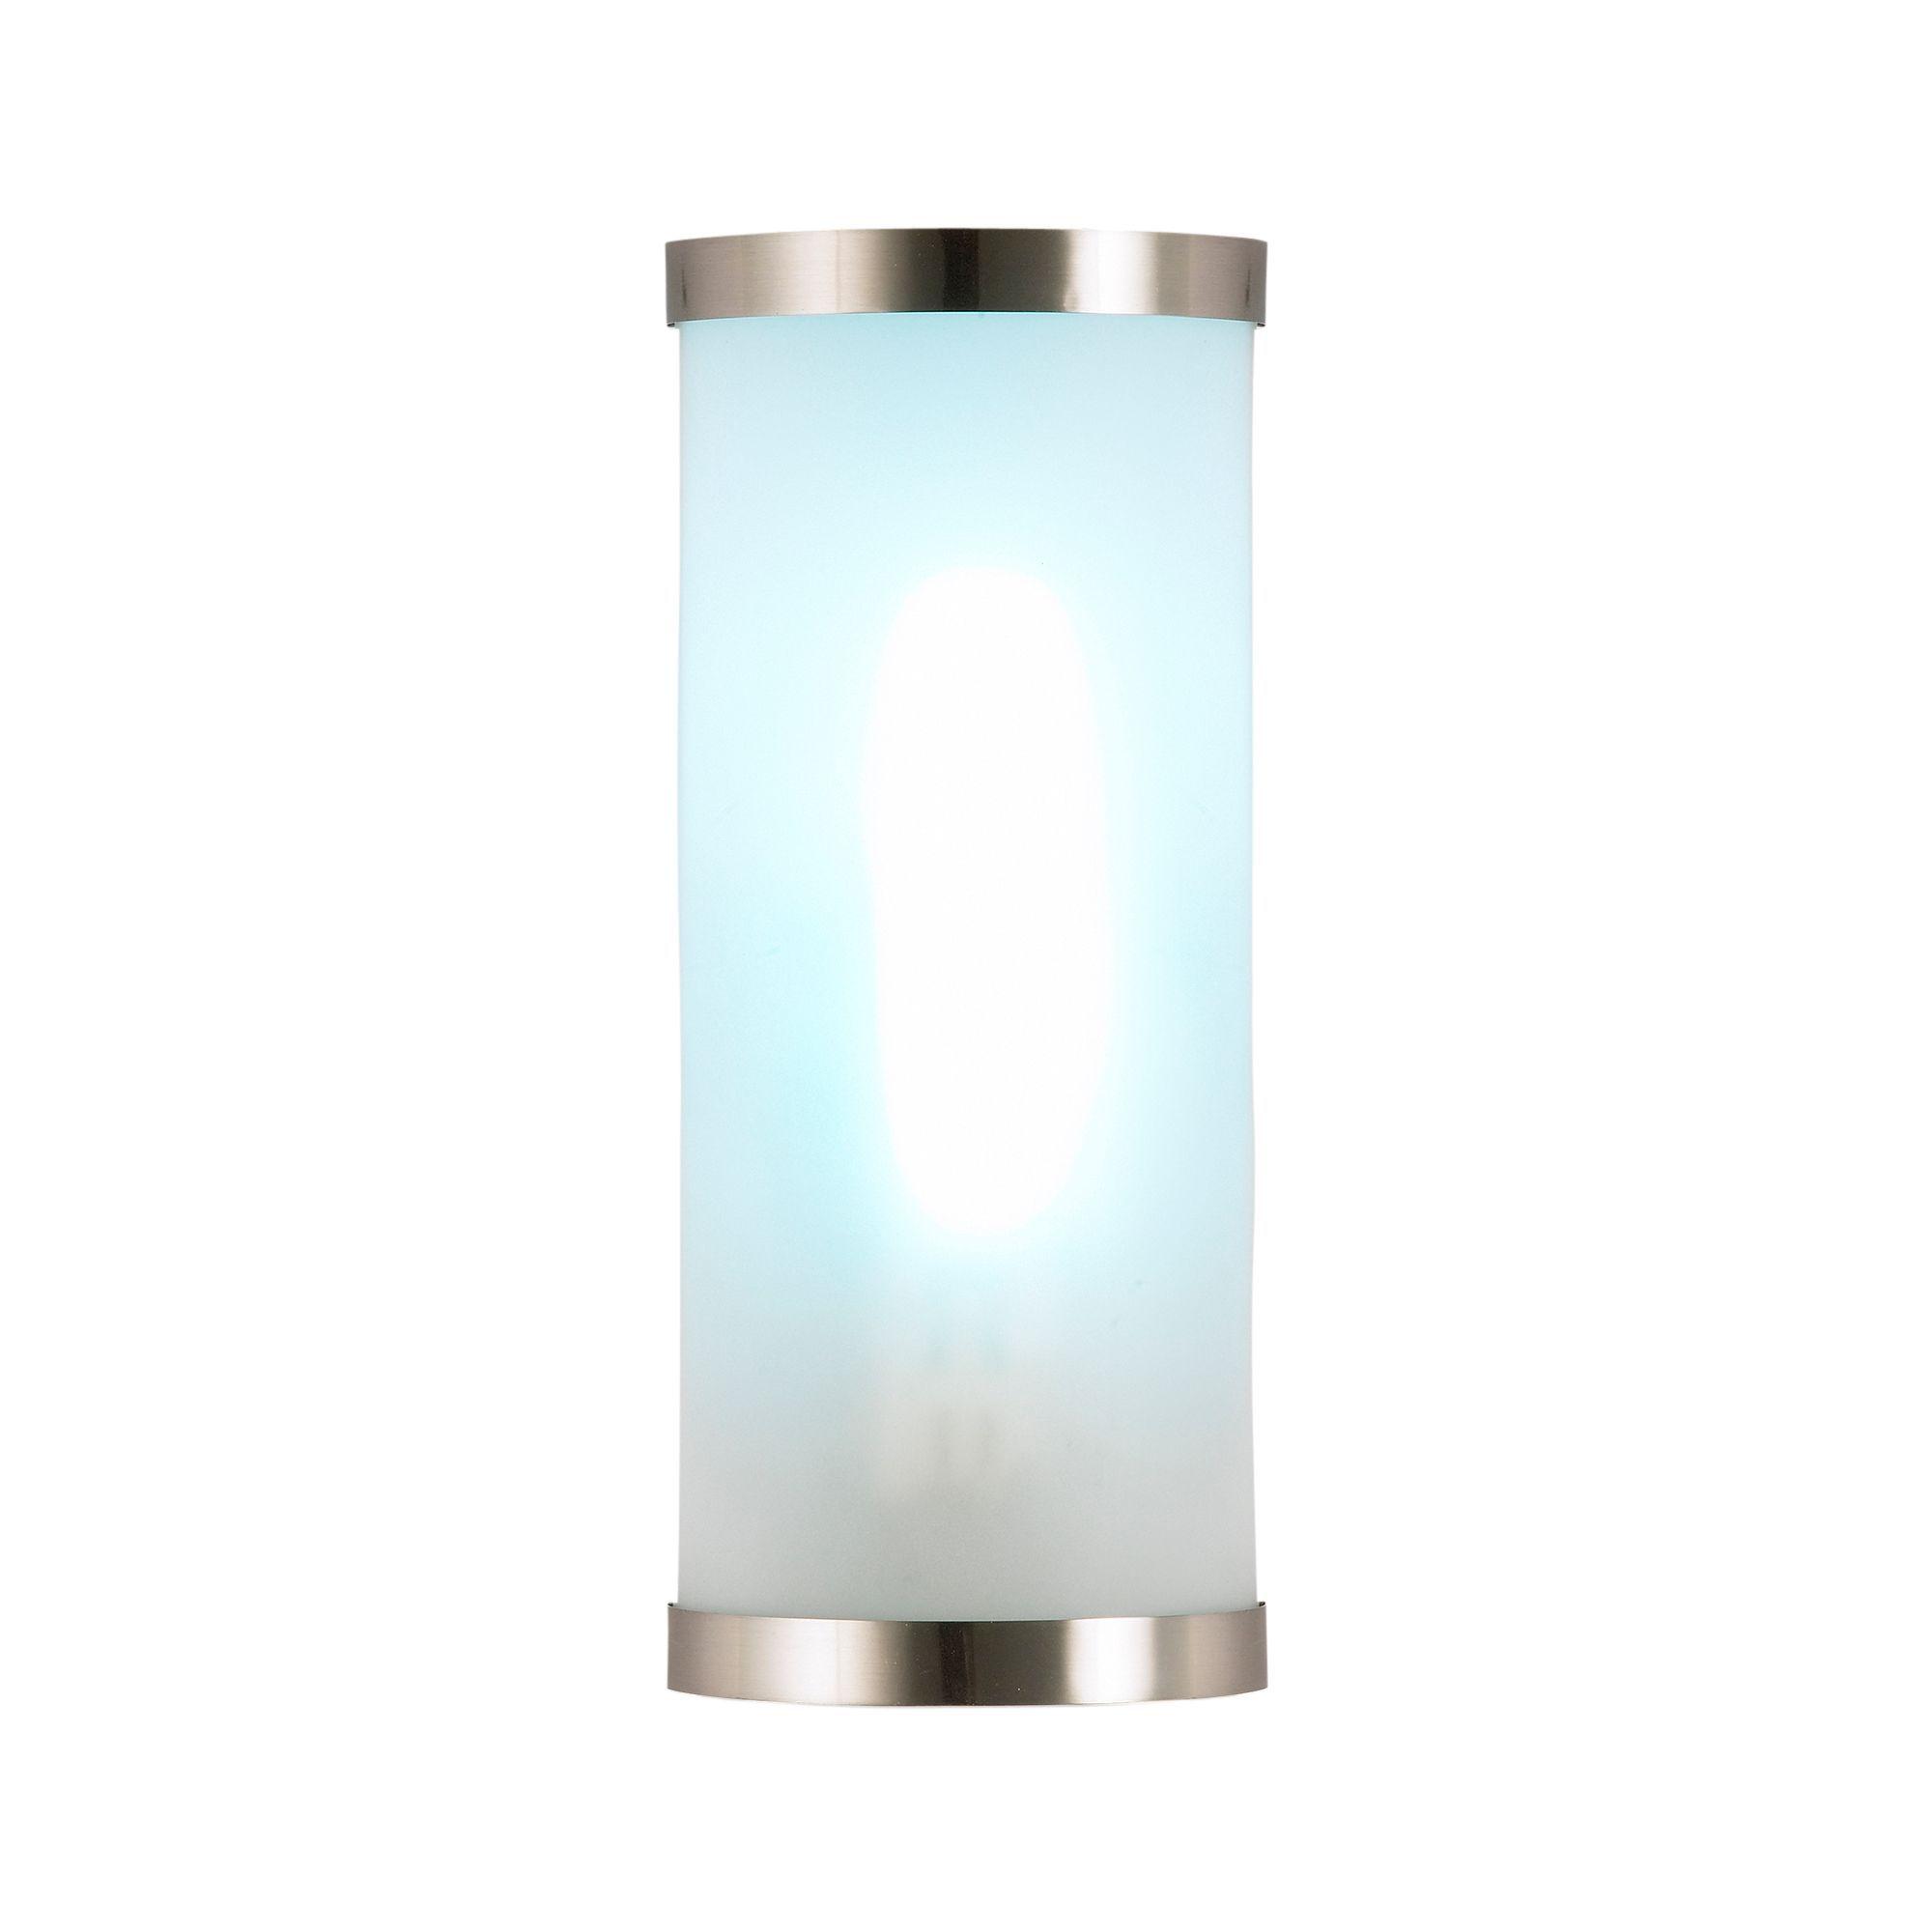 Bain Nickel Effect Cfl Pl Bathroom Wall Light